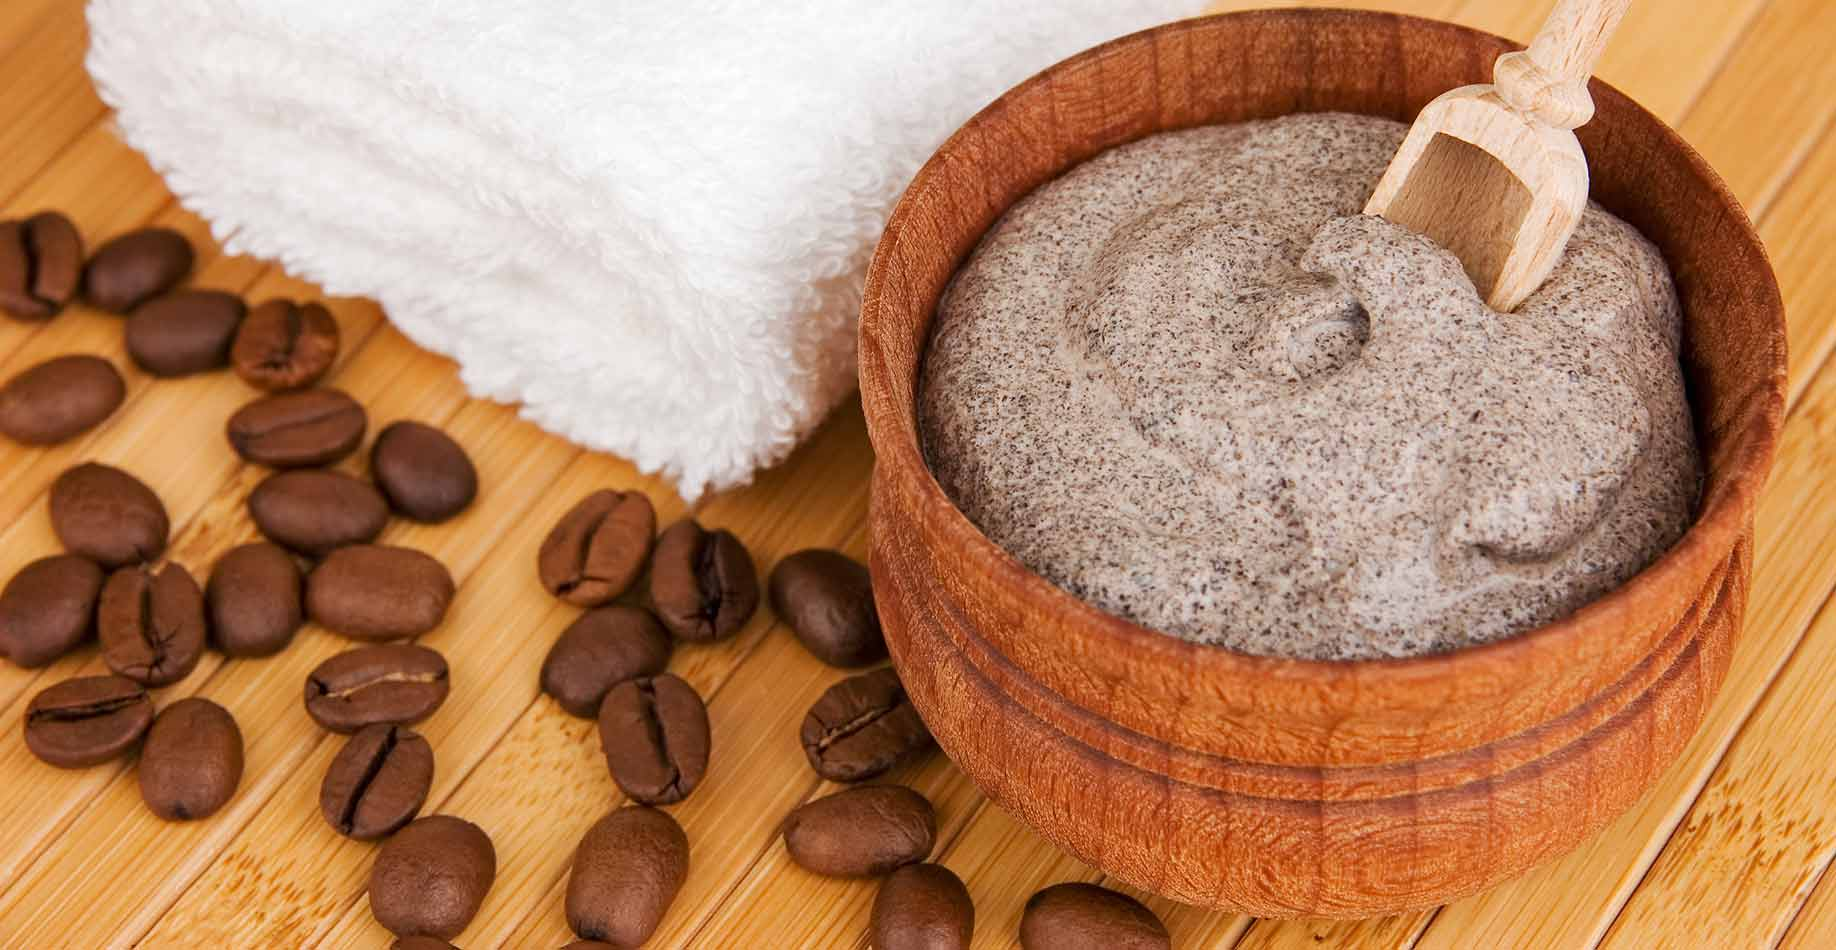 dark chocolate cocoa tree seeds health benefits flavanols flavonols